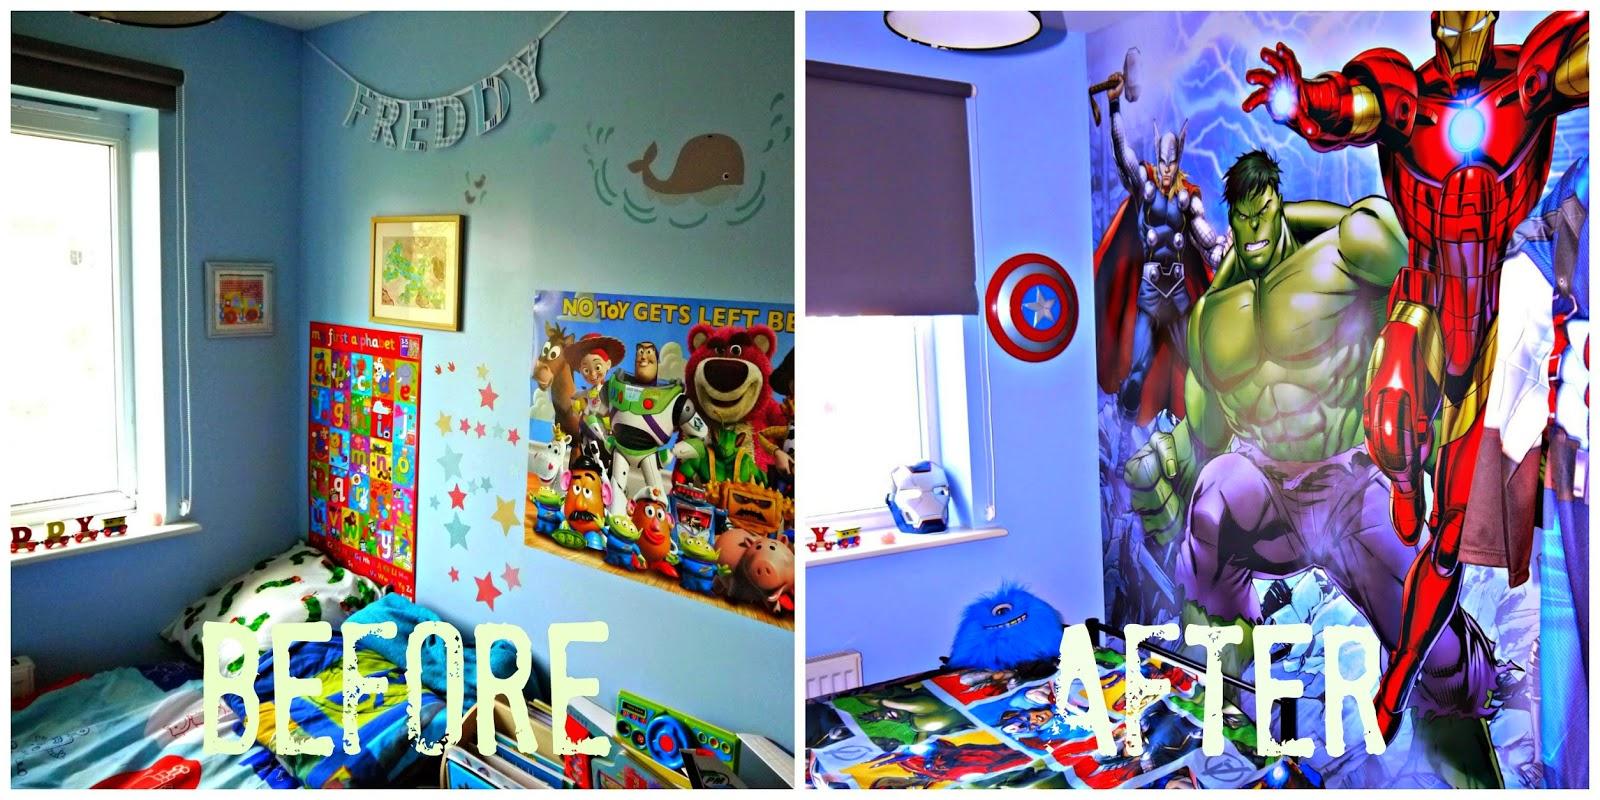 Inside the wendy house freddy 39 s avenger 39 s bedroom makeover using dulux bedroom in a box - Avengers bedroom ...